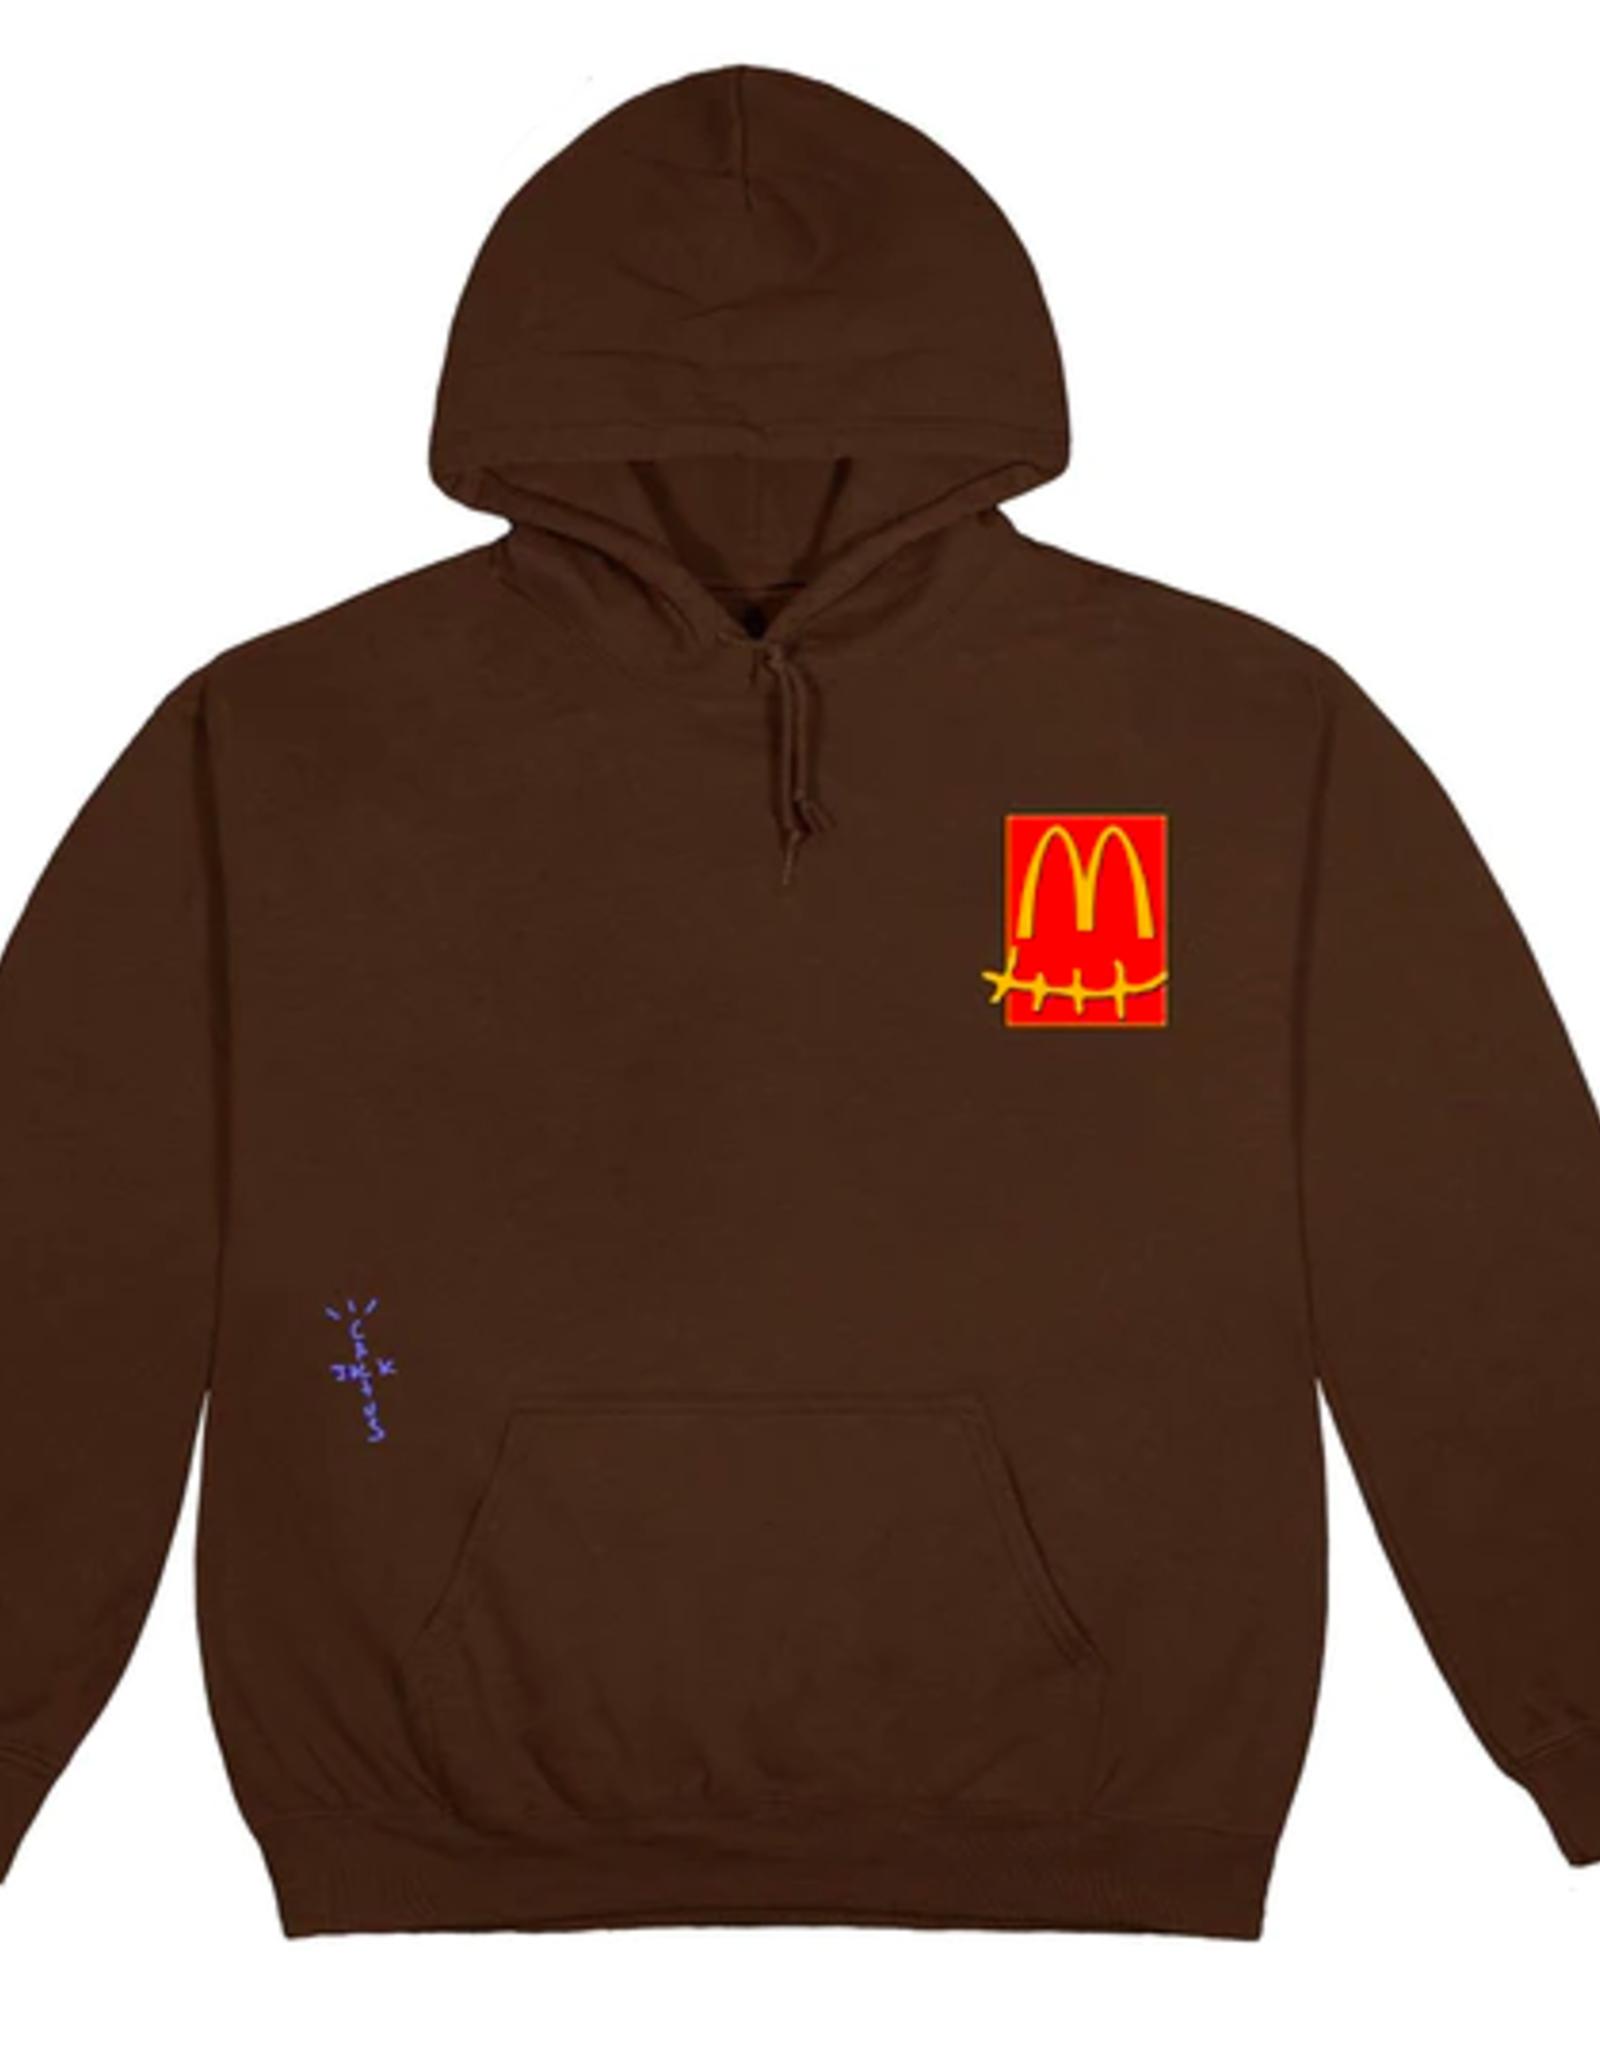 Travis Scott x McDonald's Cactus Pack Sticker Hoodie Brown